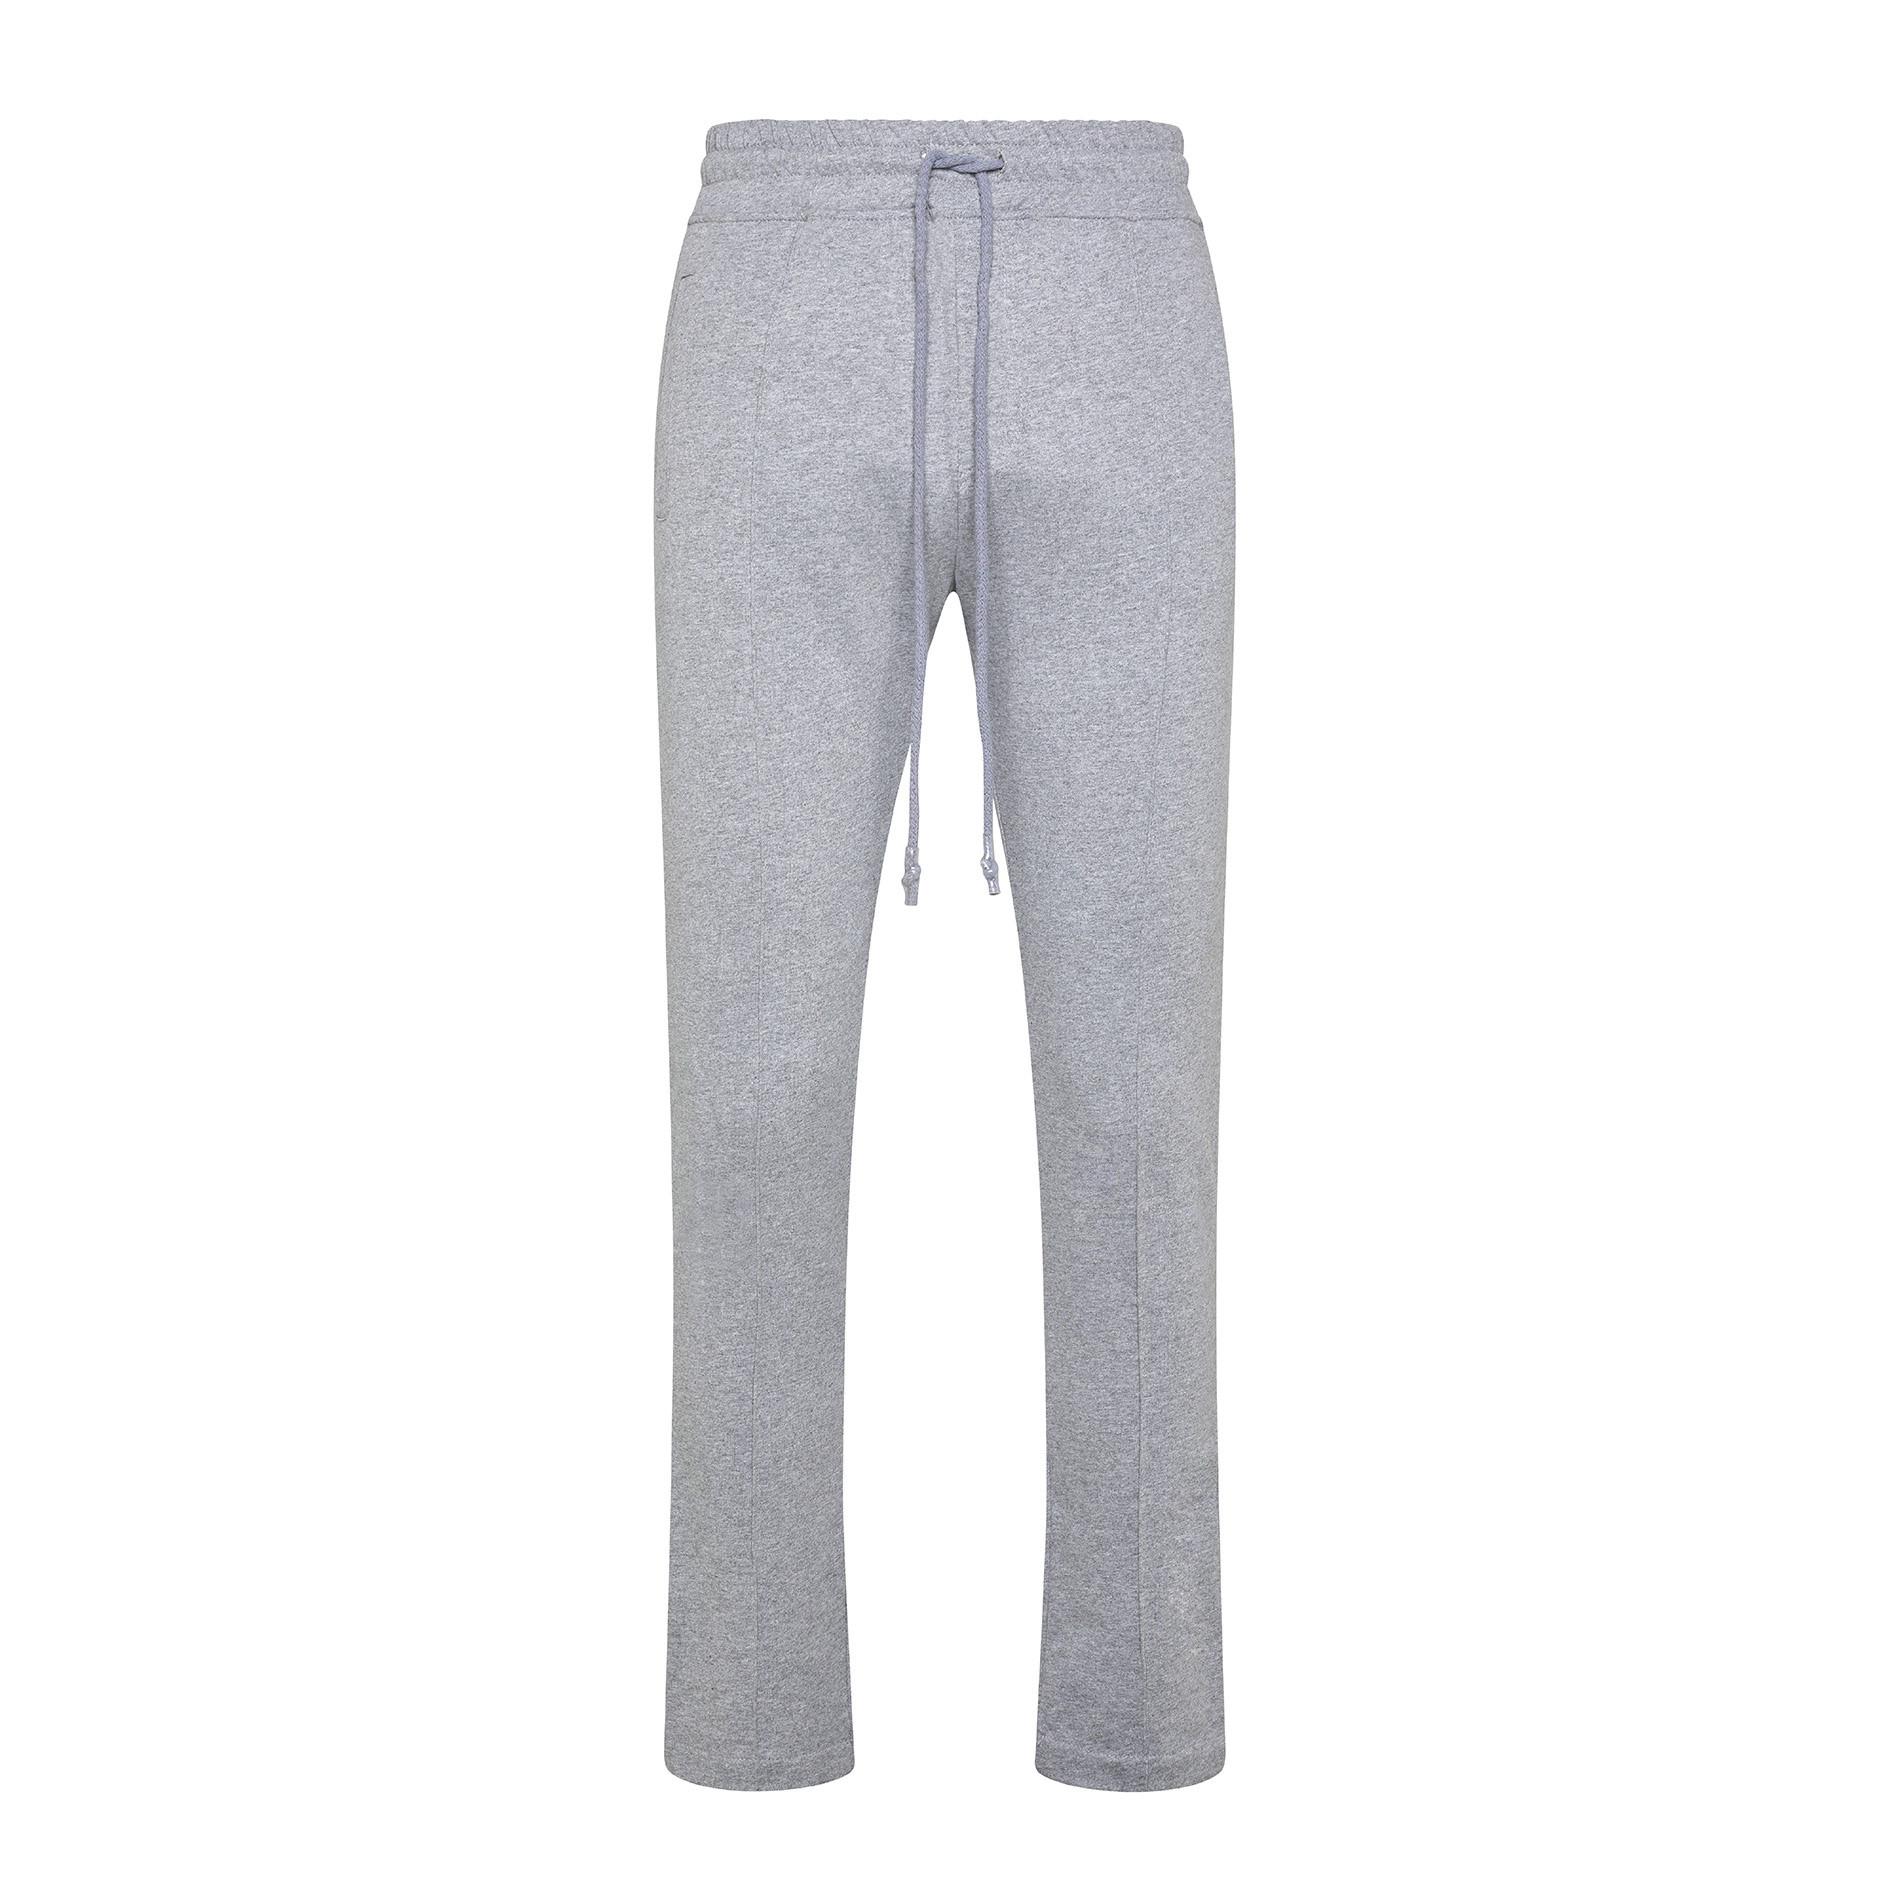 Pantalone felpa di cotone JCT, Grigio, large image number 0